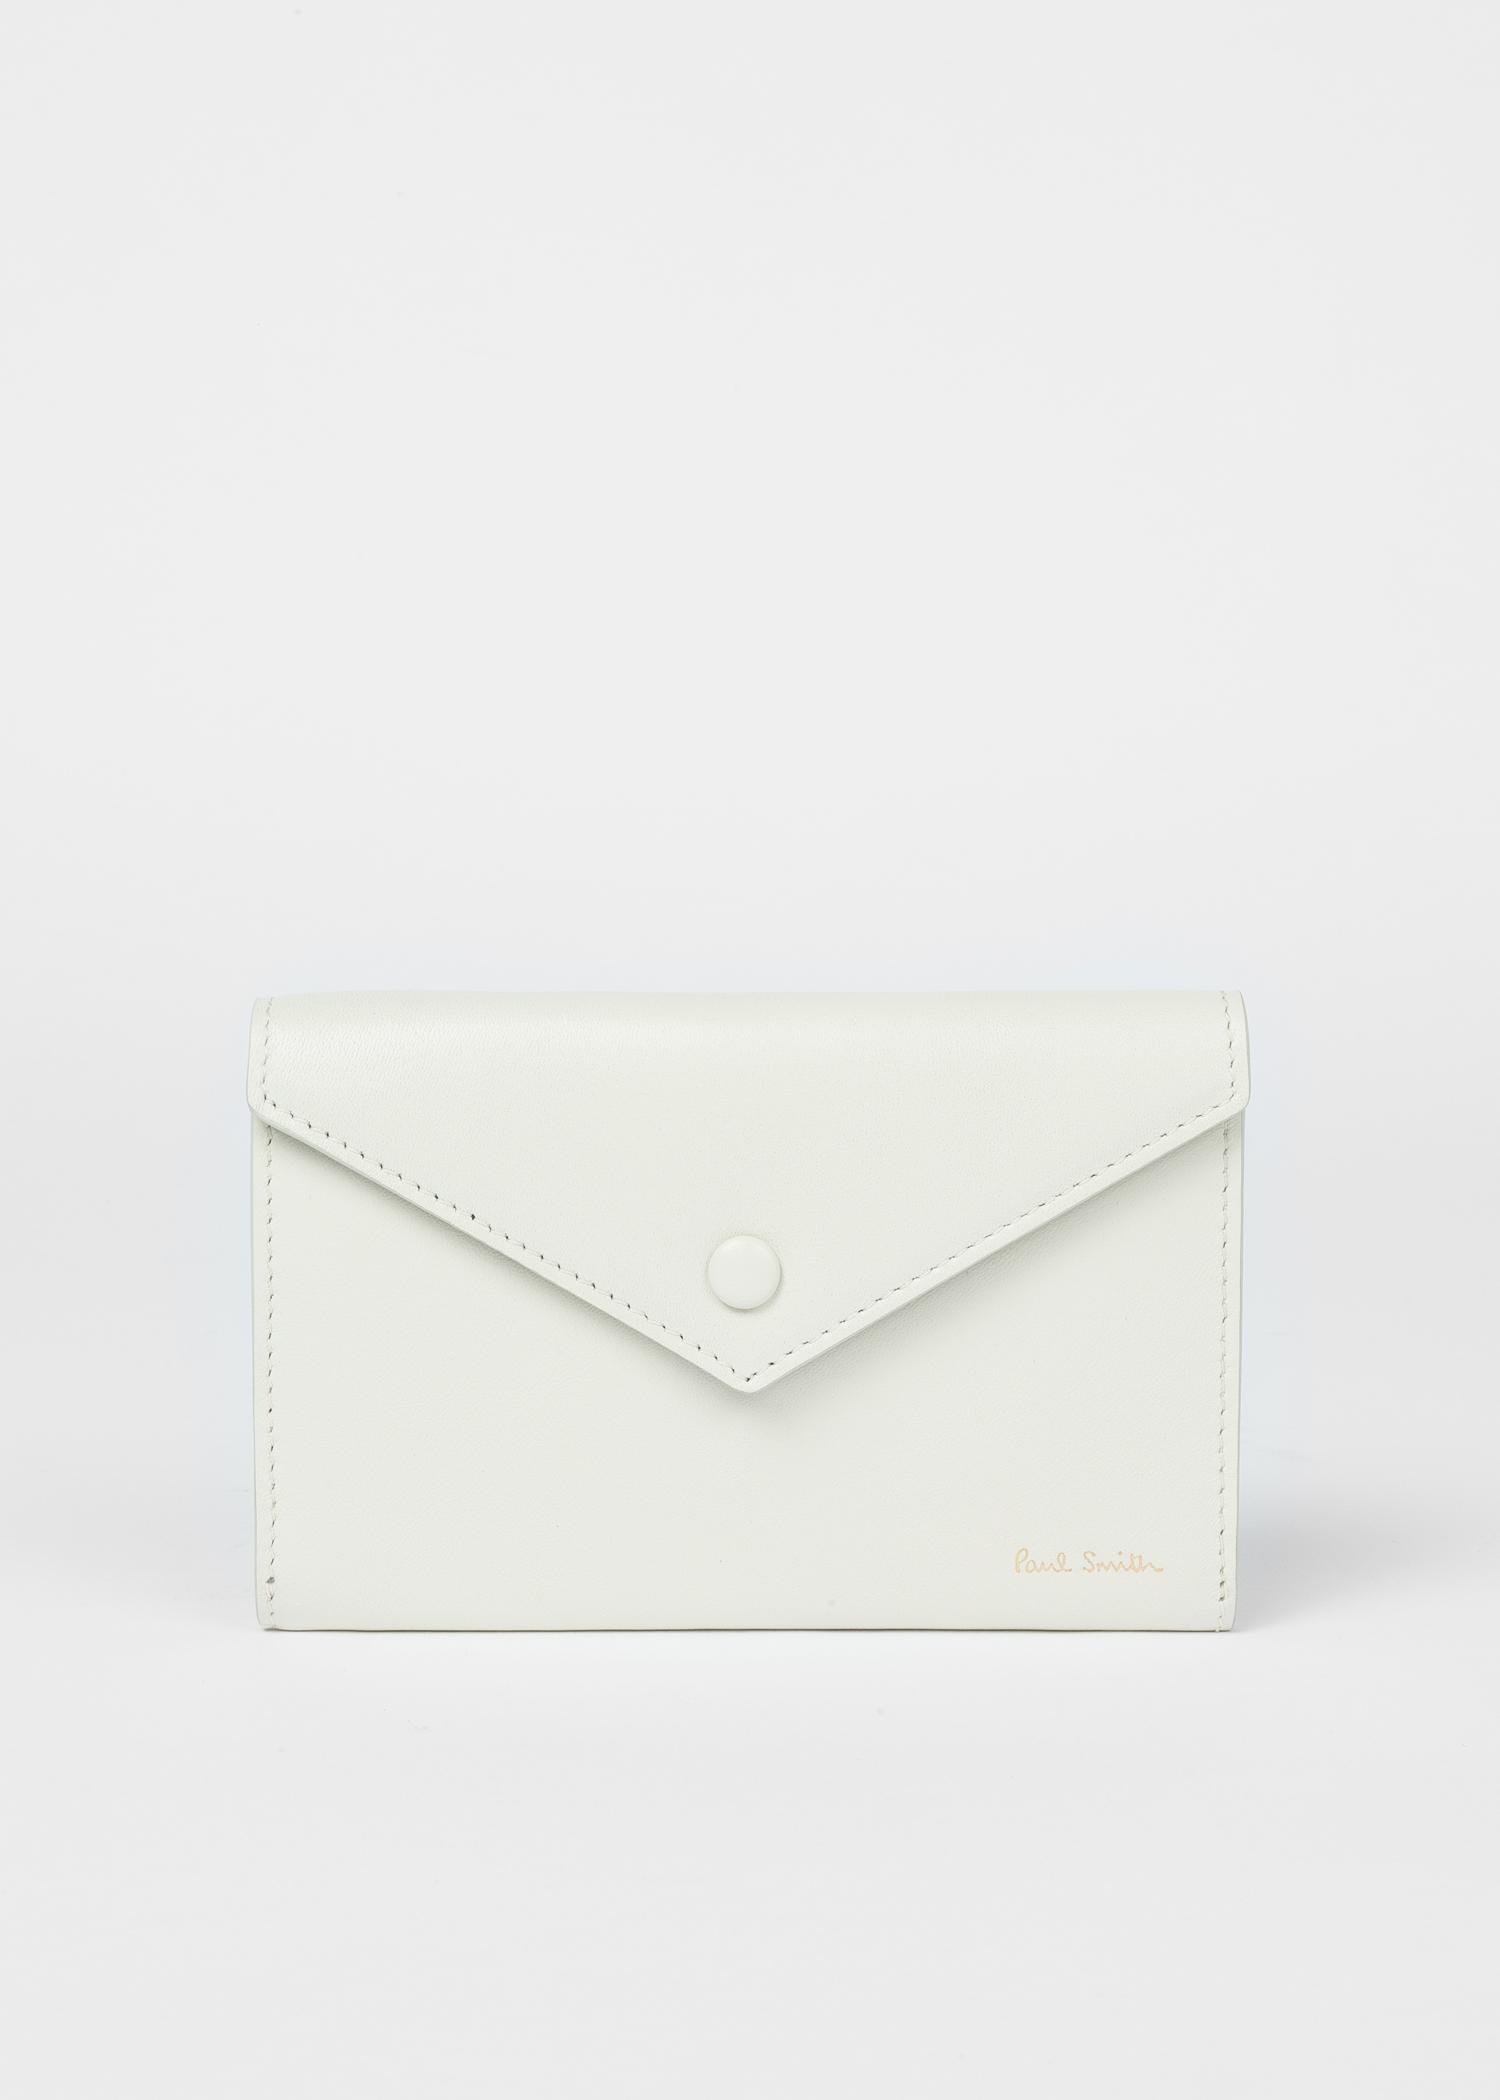 019ec19e516f Front View - Women s Off-White  Envelope  Leather Medium Purse Paul Smith